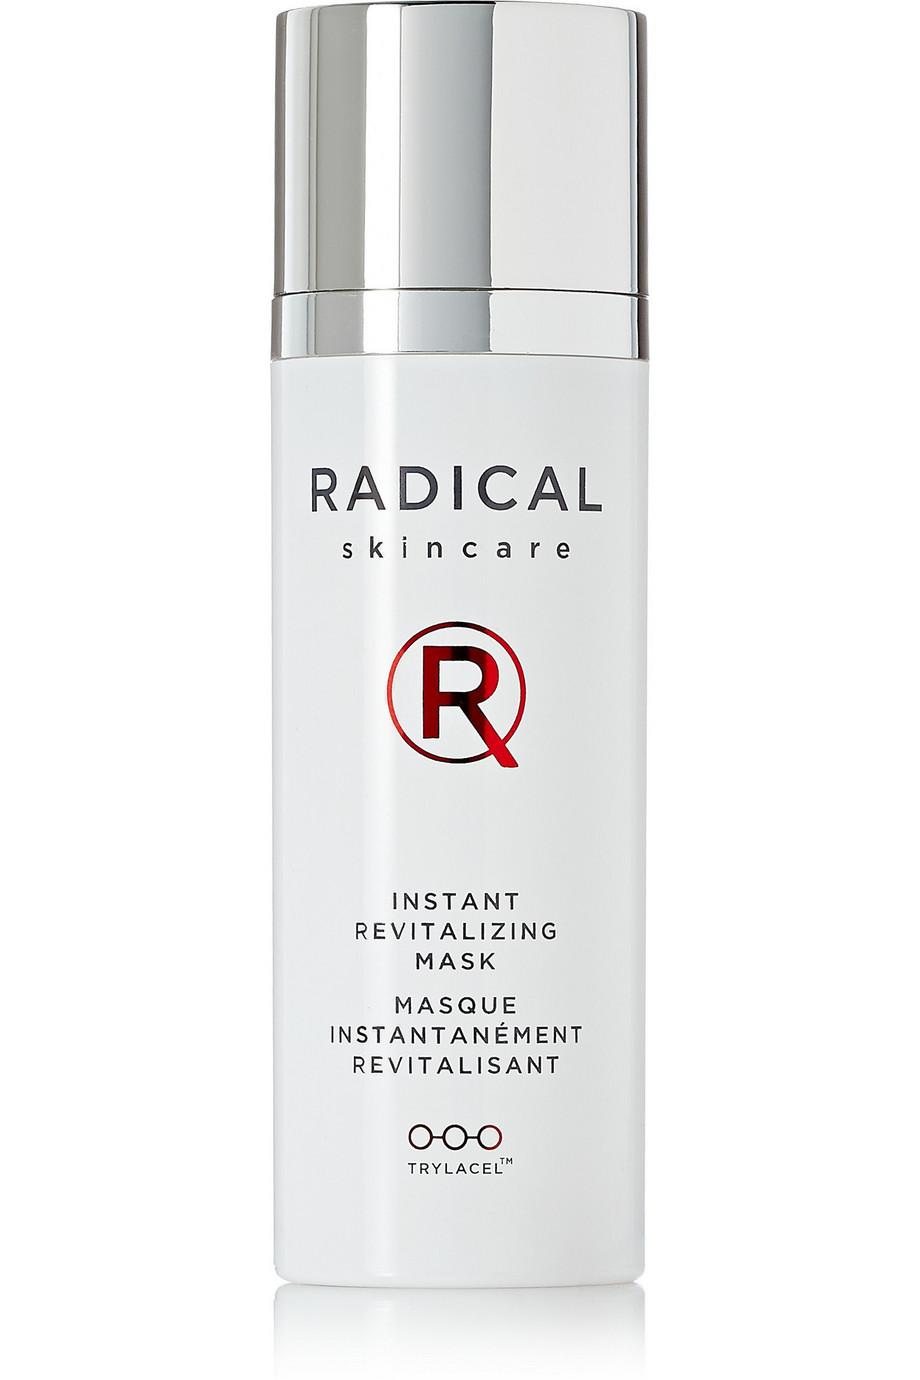 Instant Revitalizing Mask, 30ml, by Radical Skincare